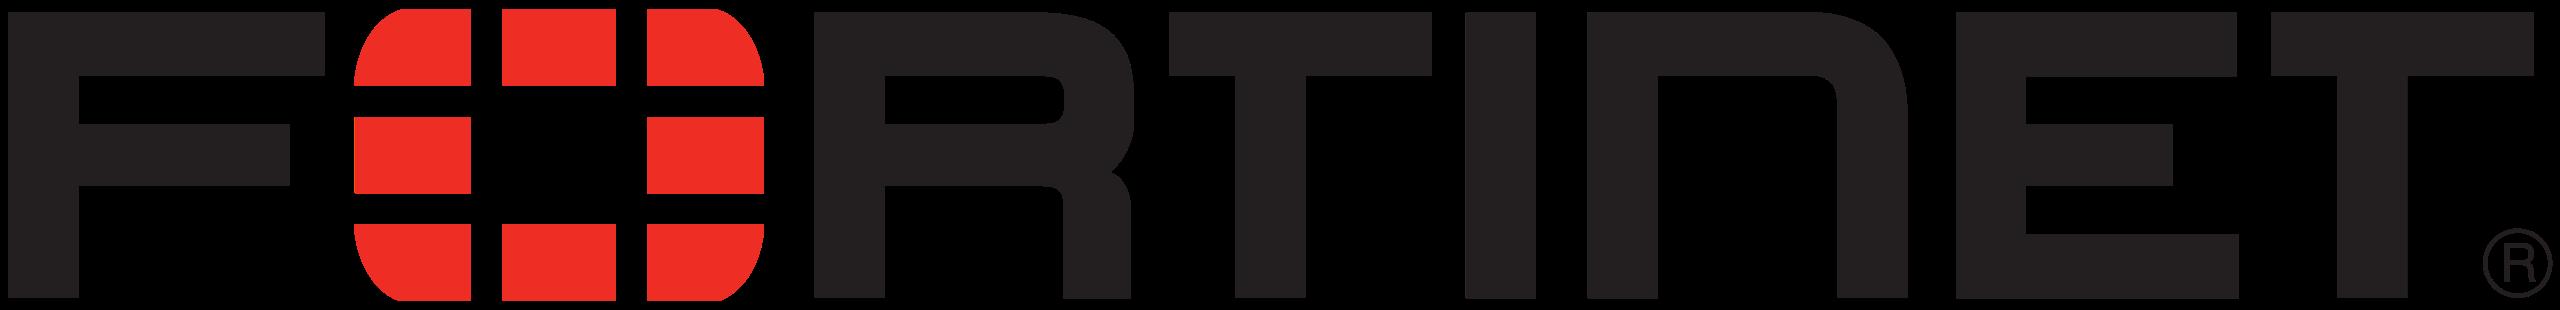 Fortinet-transparent